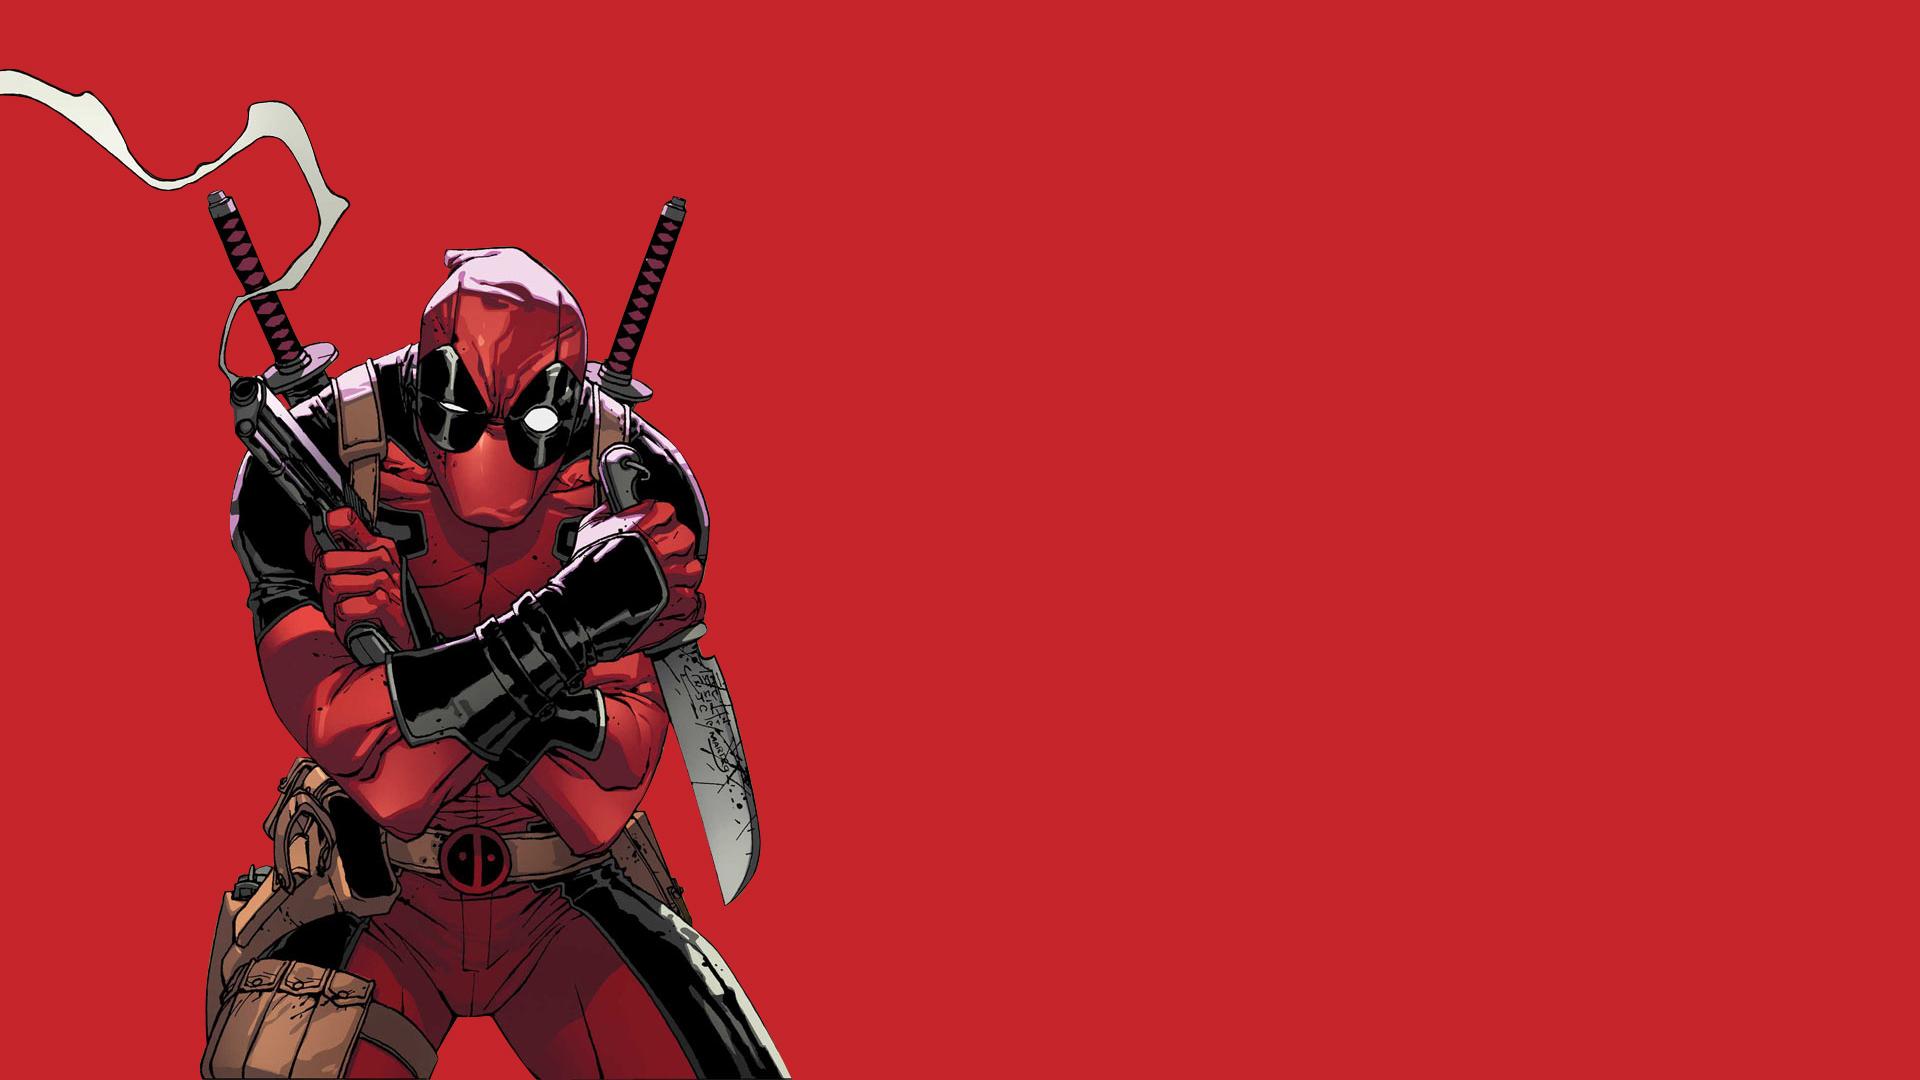 Lady Deadpool Hd Wallpapers Backgrounds Wallpaper 1920x1080